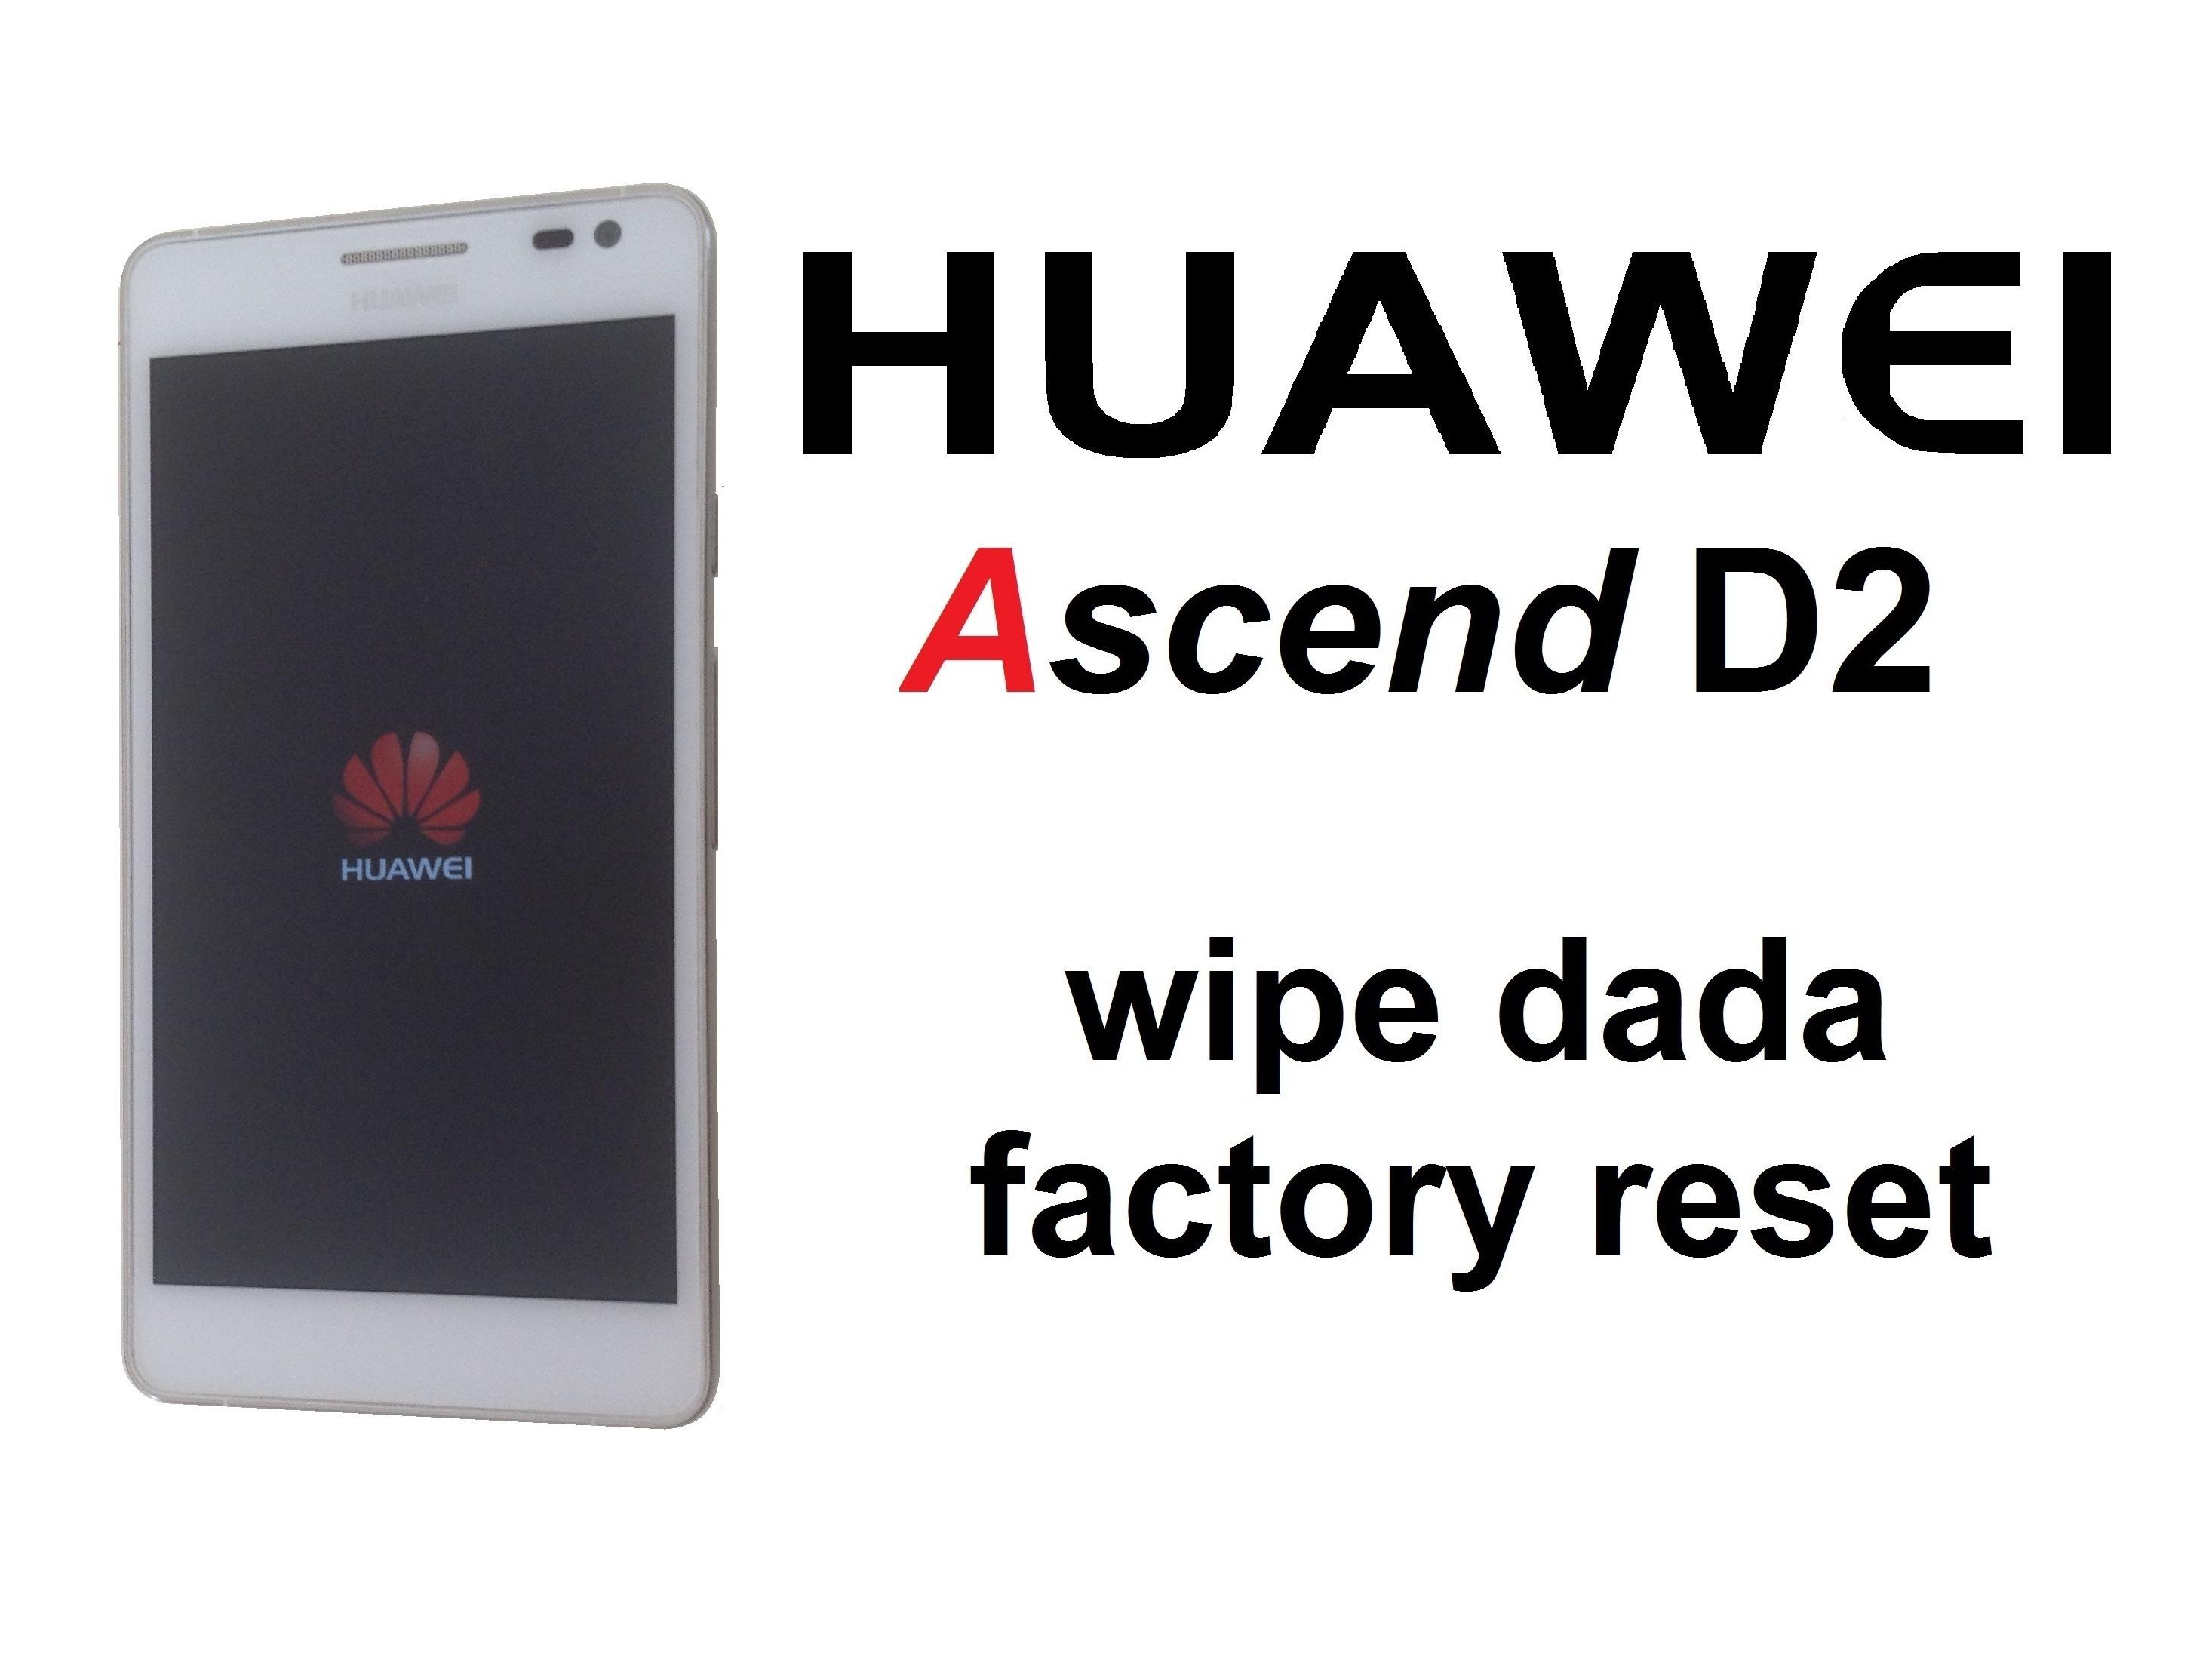 Huawei Ascend D2 Repair - iFixit